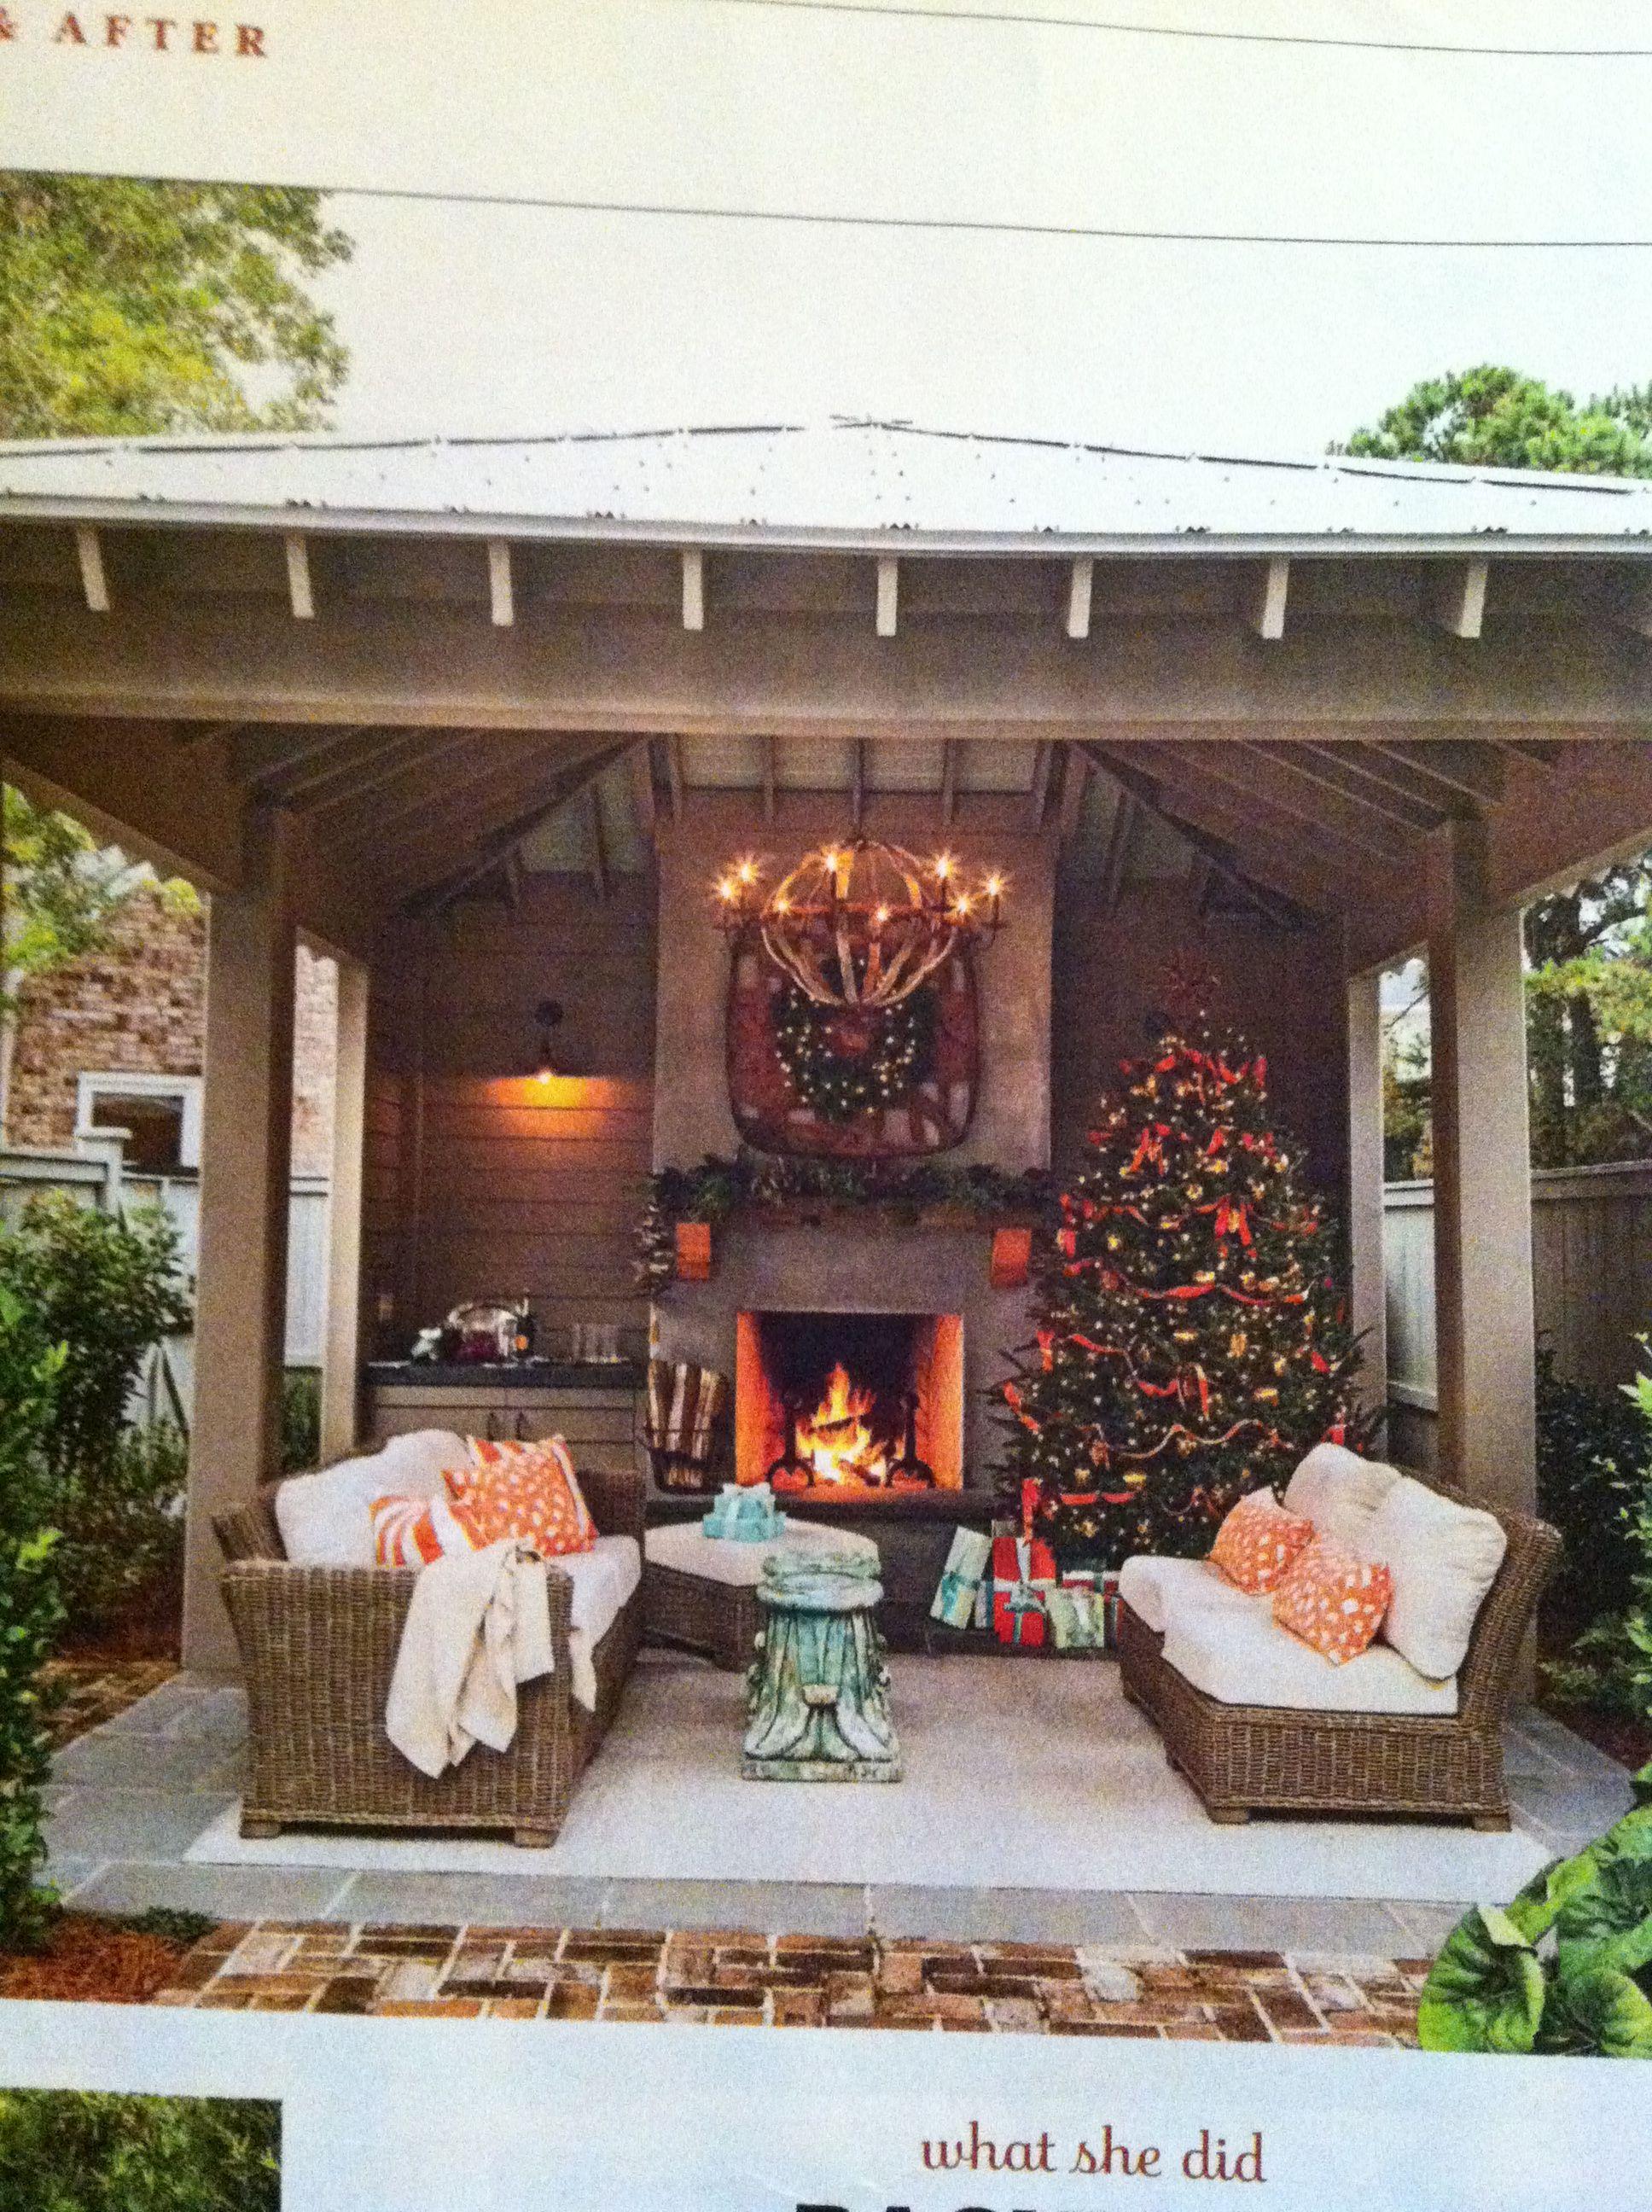 Backyard Instead Of A Gazebo Backyard Fireplace Outdoor Fireplace Designs Outdoor Fireplace